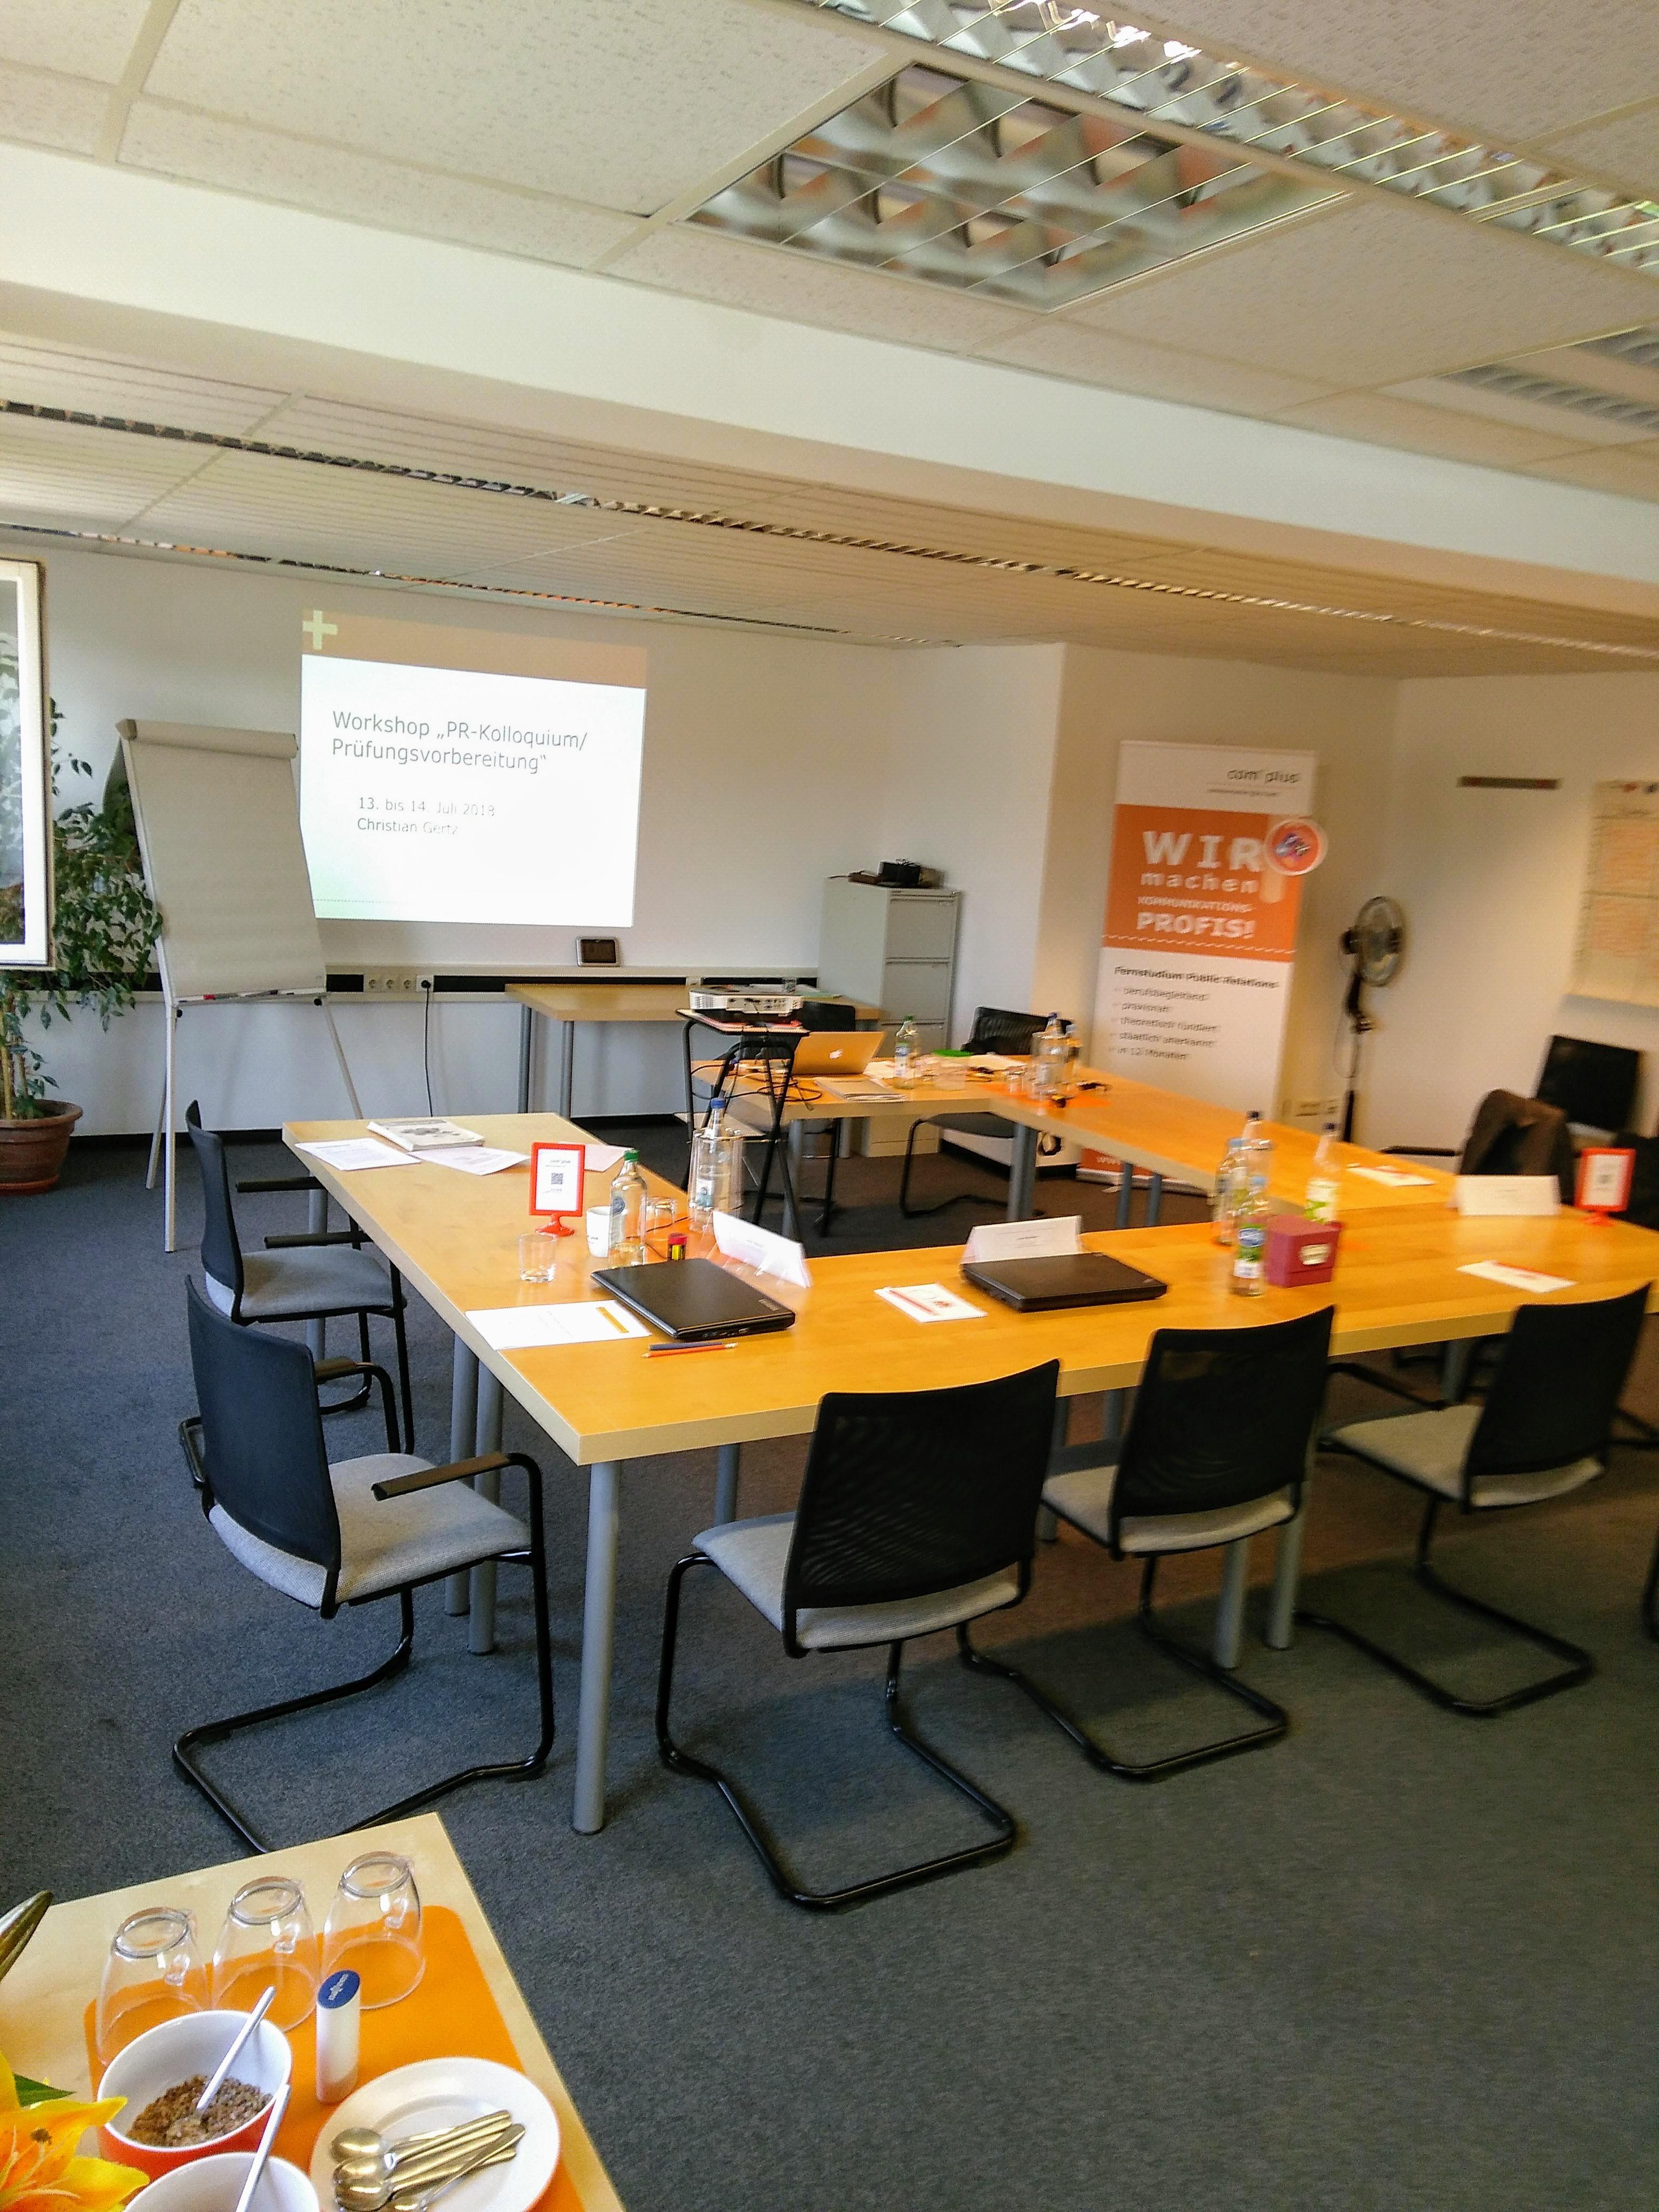 Foto aus dem complus Workshop Pruefungsvorbereitung - Juni 2018 (c) C. Gertz